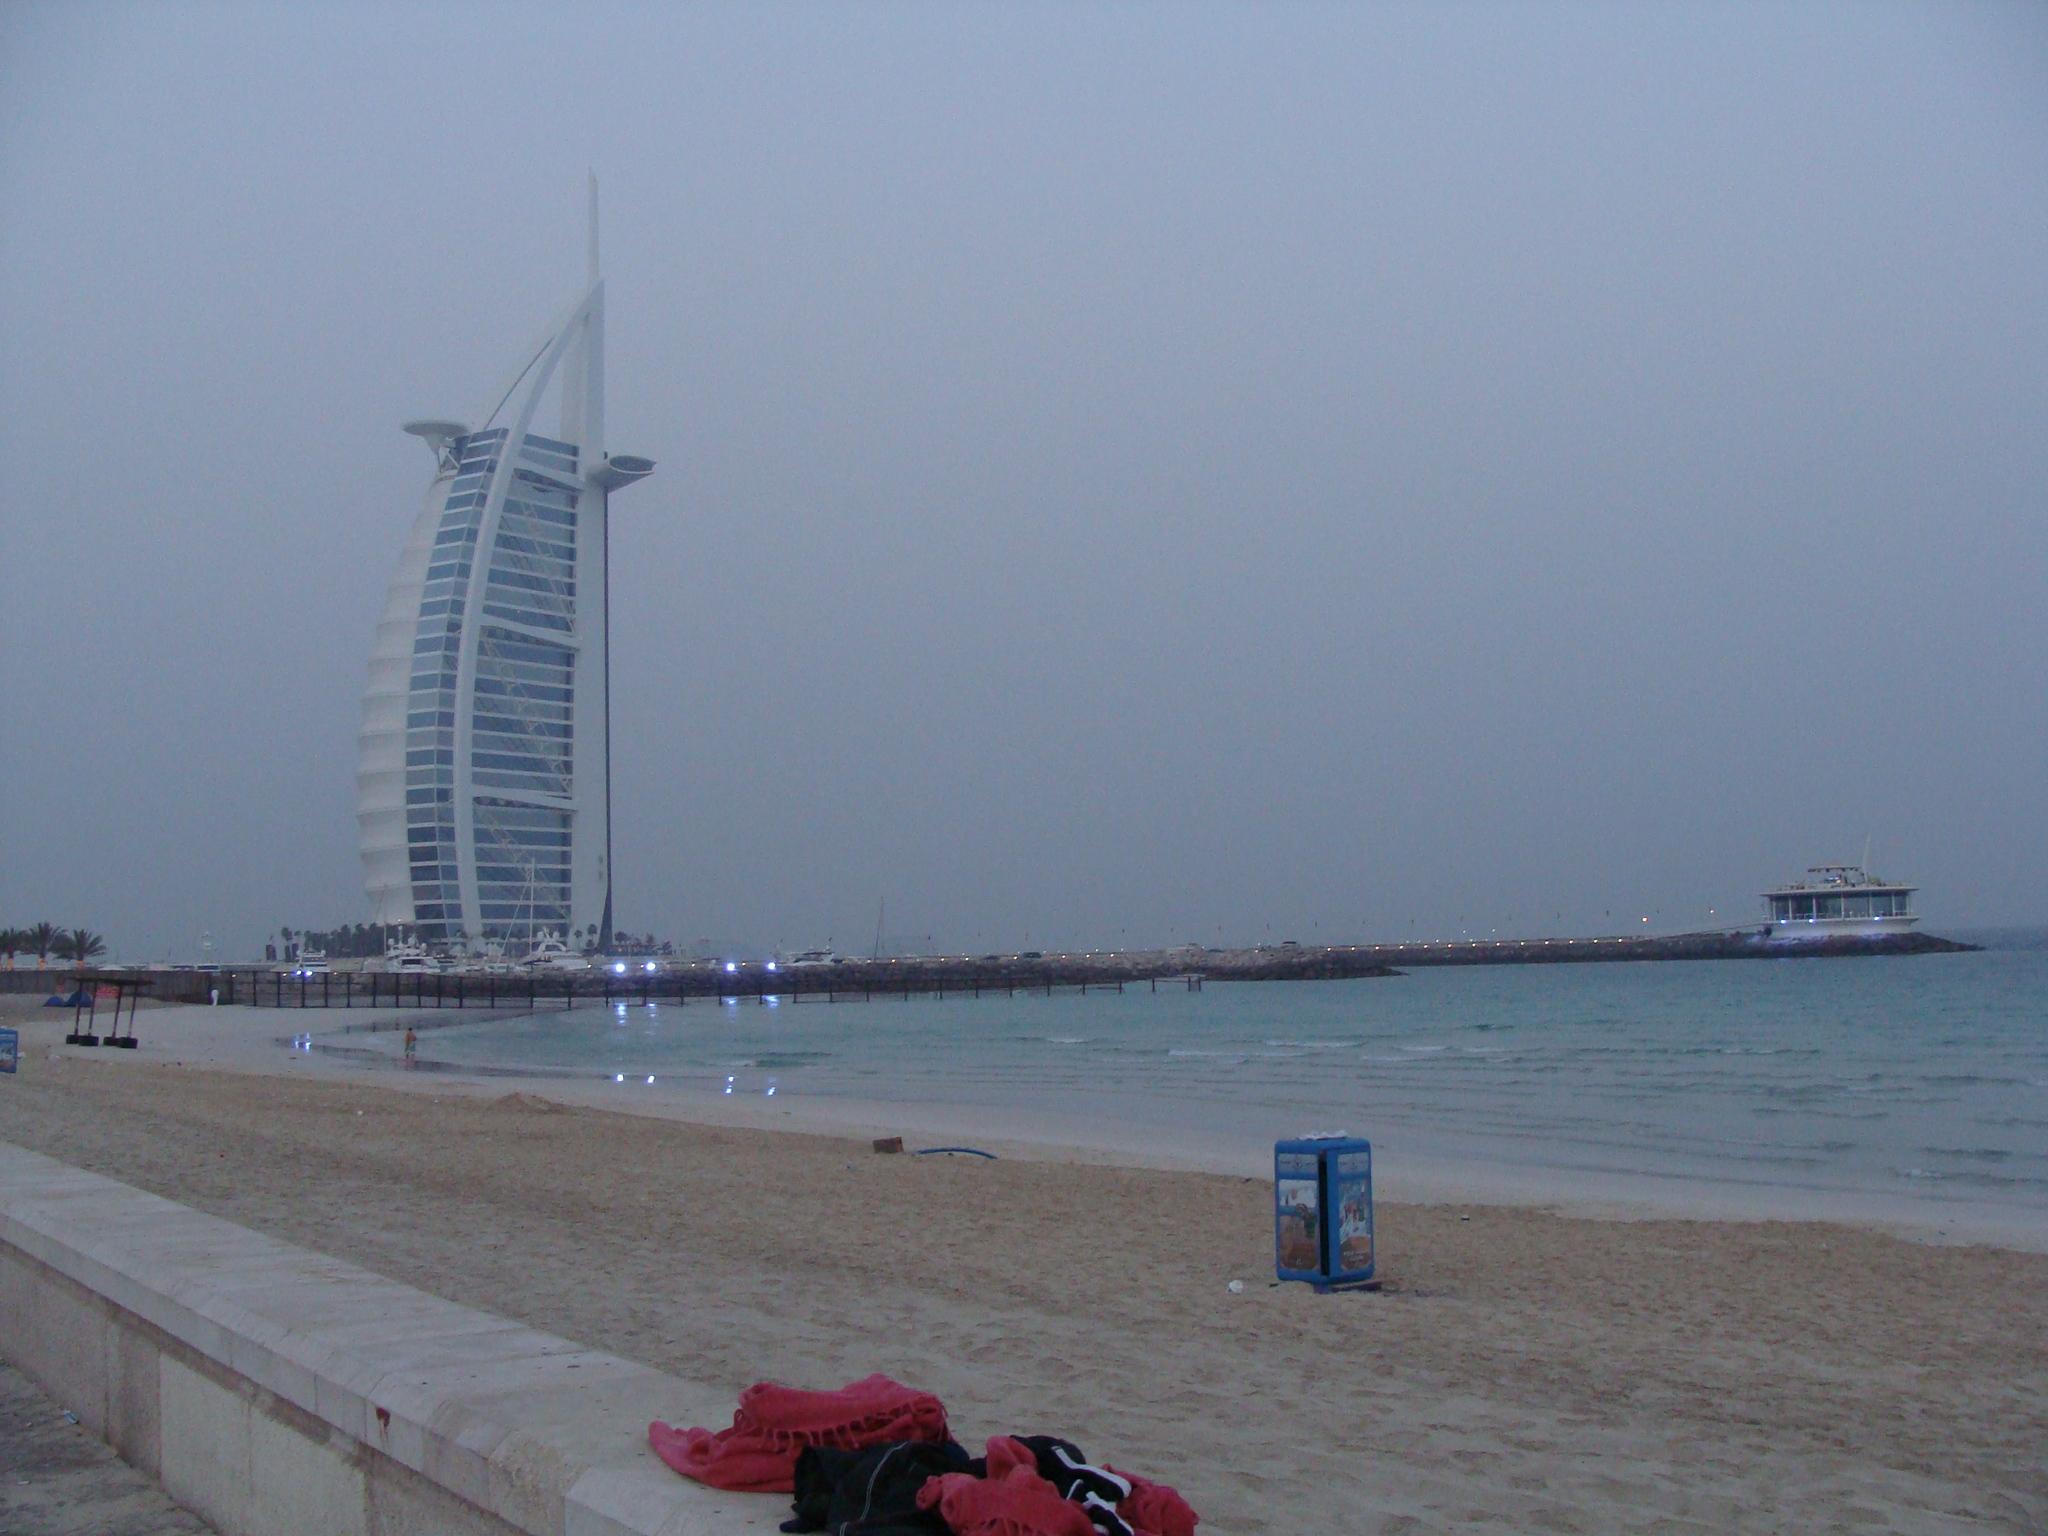 [PH] Burj al-Arab, Dubai, UAE, 20080418